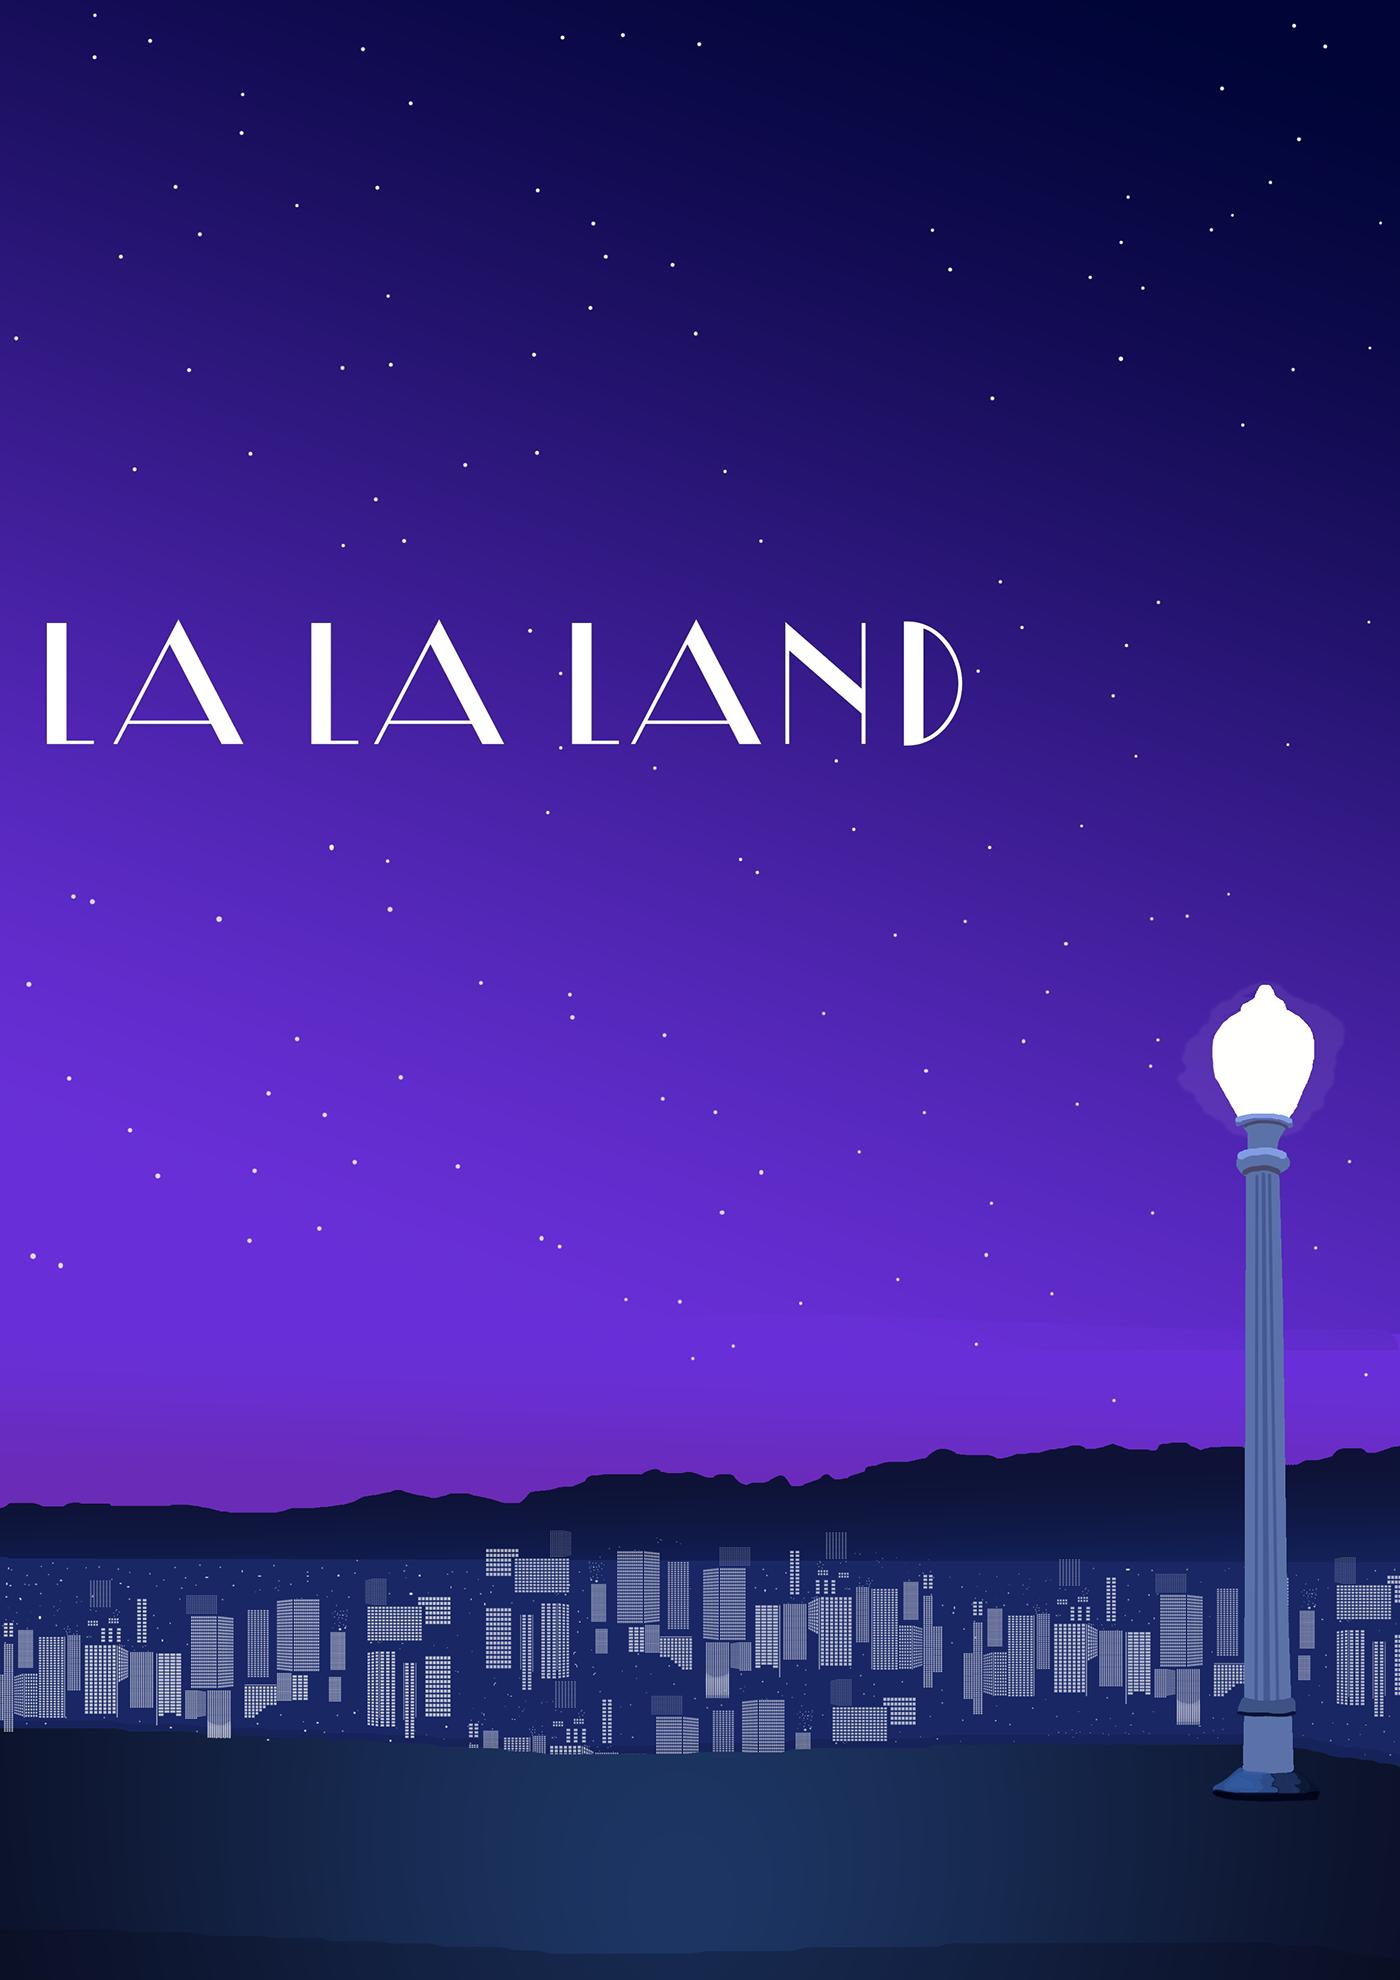 La La Land Poster Vector Recreation On Behance